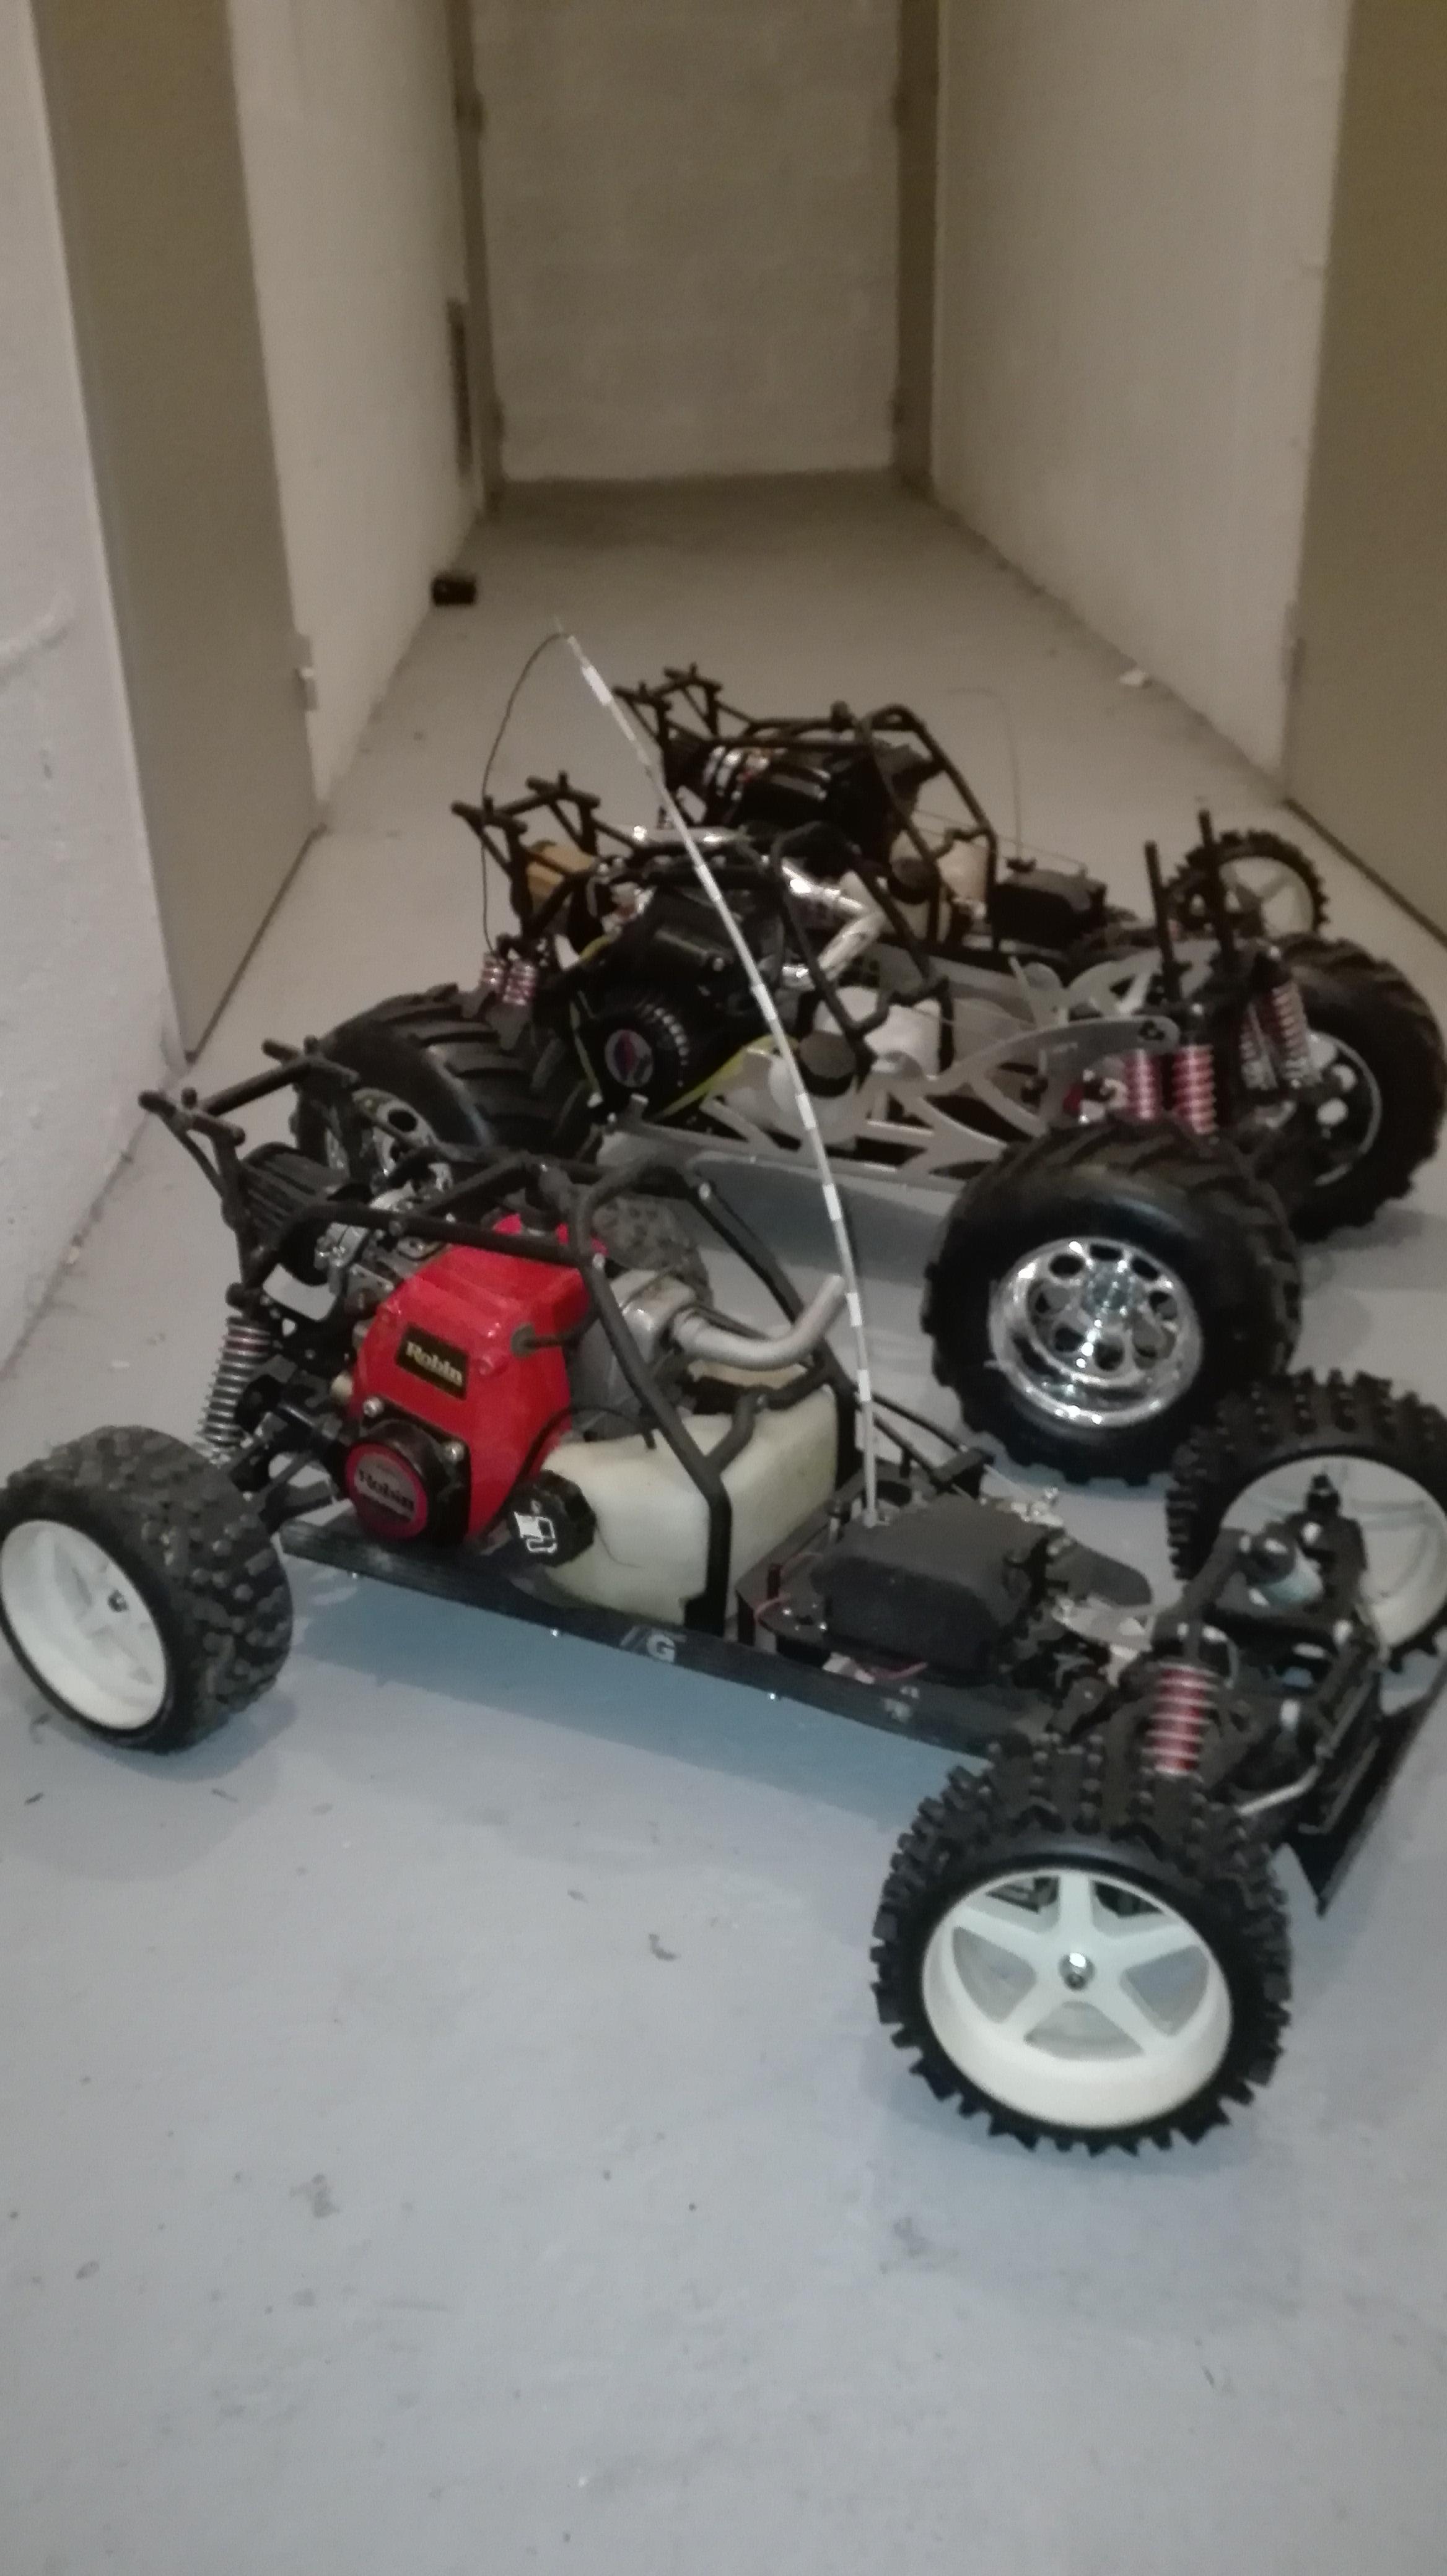 re-montage complet monster truck FG depuis un chassis nu - Page 2 18030306185194884